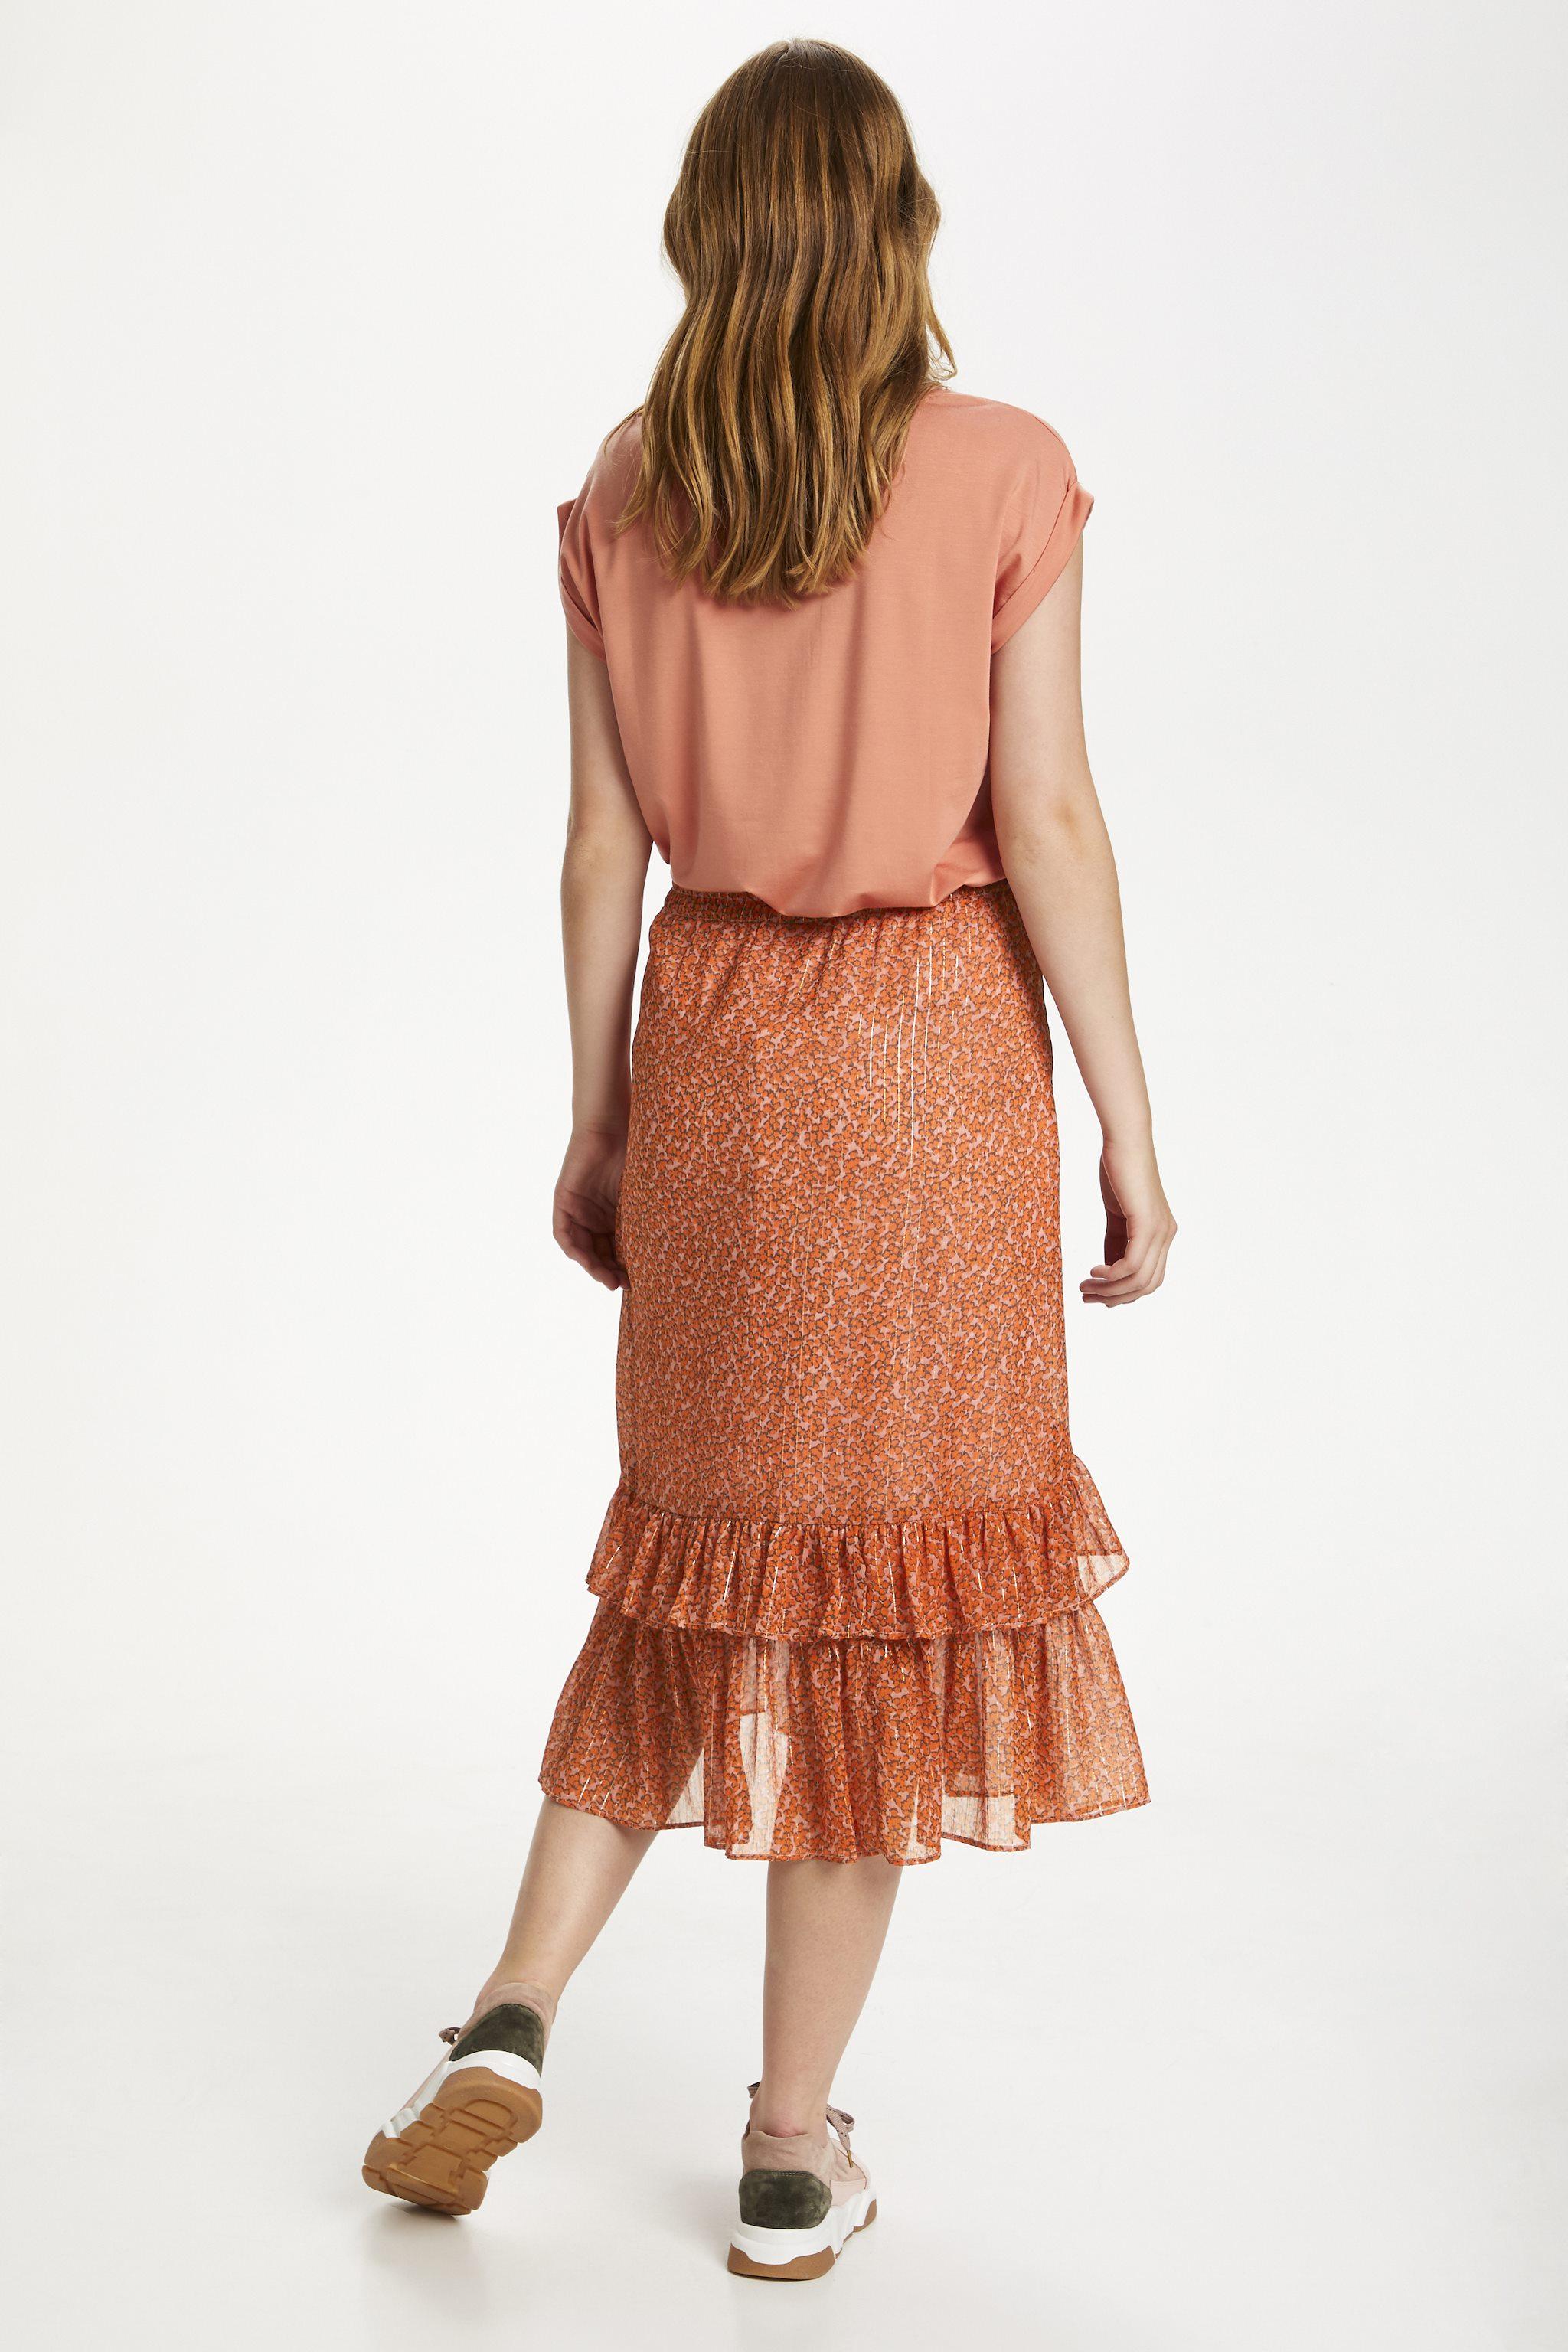 Saint Tropez Xelina nederdel, red orange puff sky, x-large